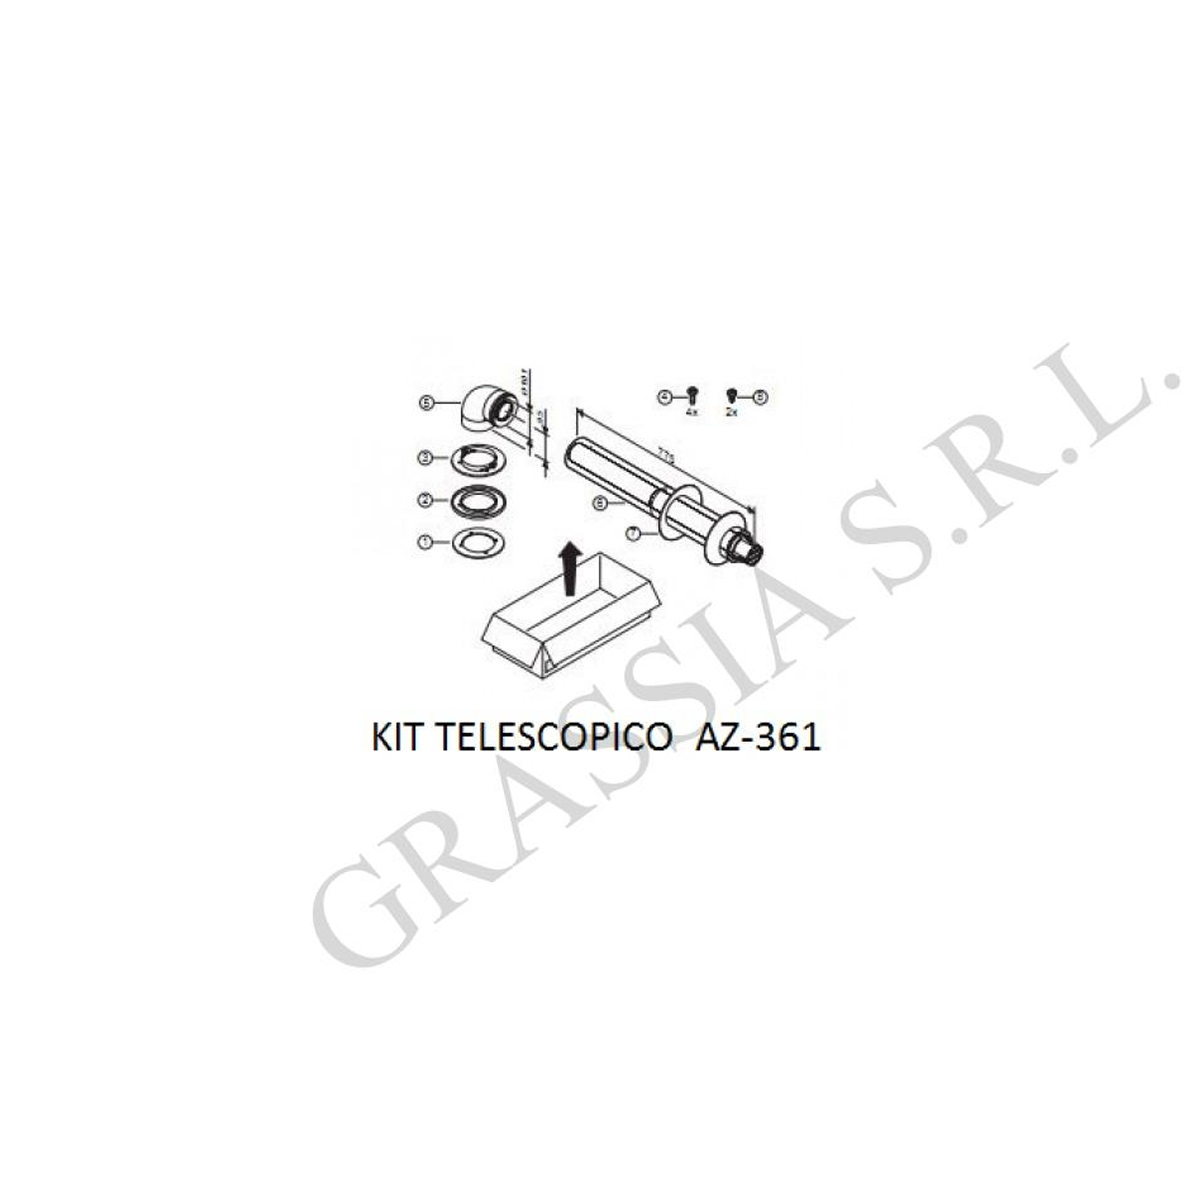 Kit telescopico AZ361